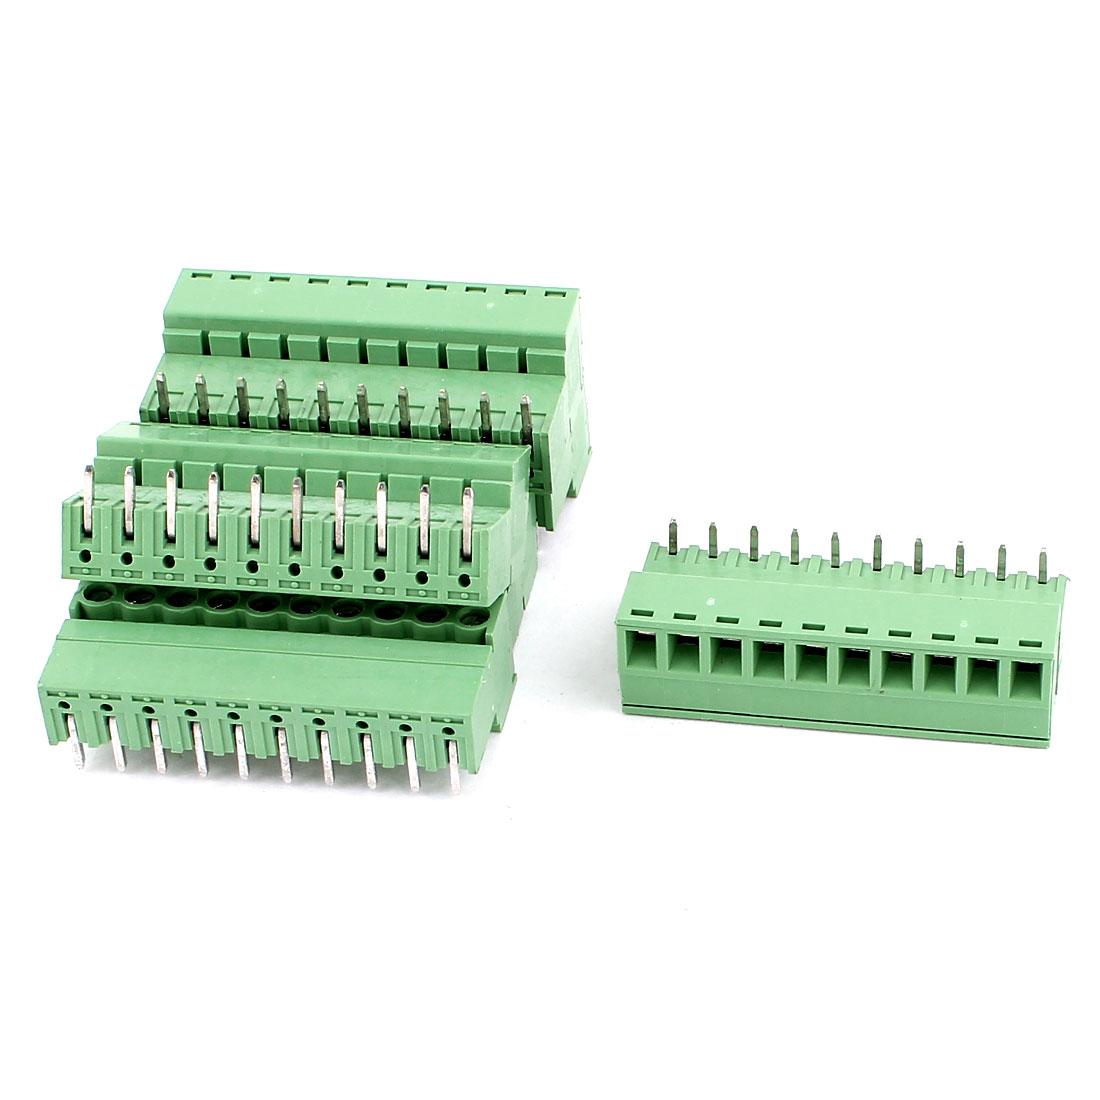 6 Pcs AC 300V 8A 10 Pins PCB Terminal Block Connector 3.81mm Pitch Green